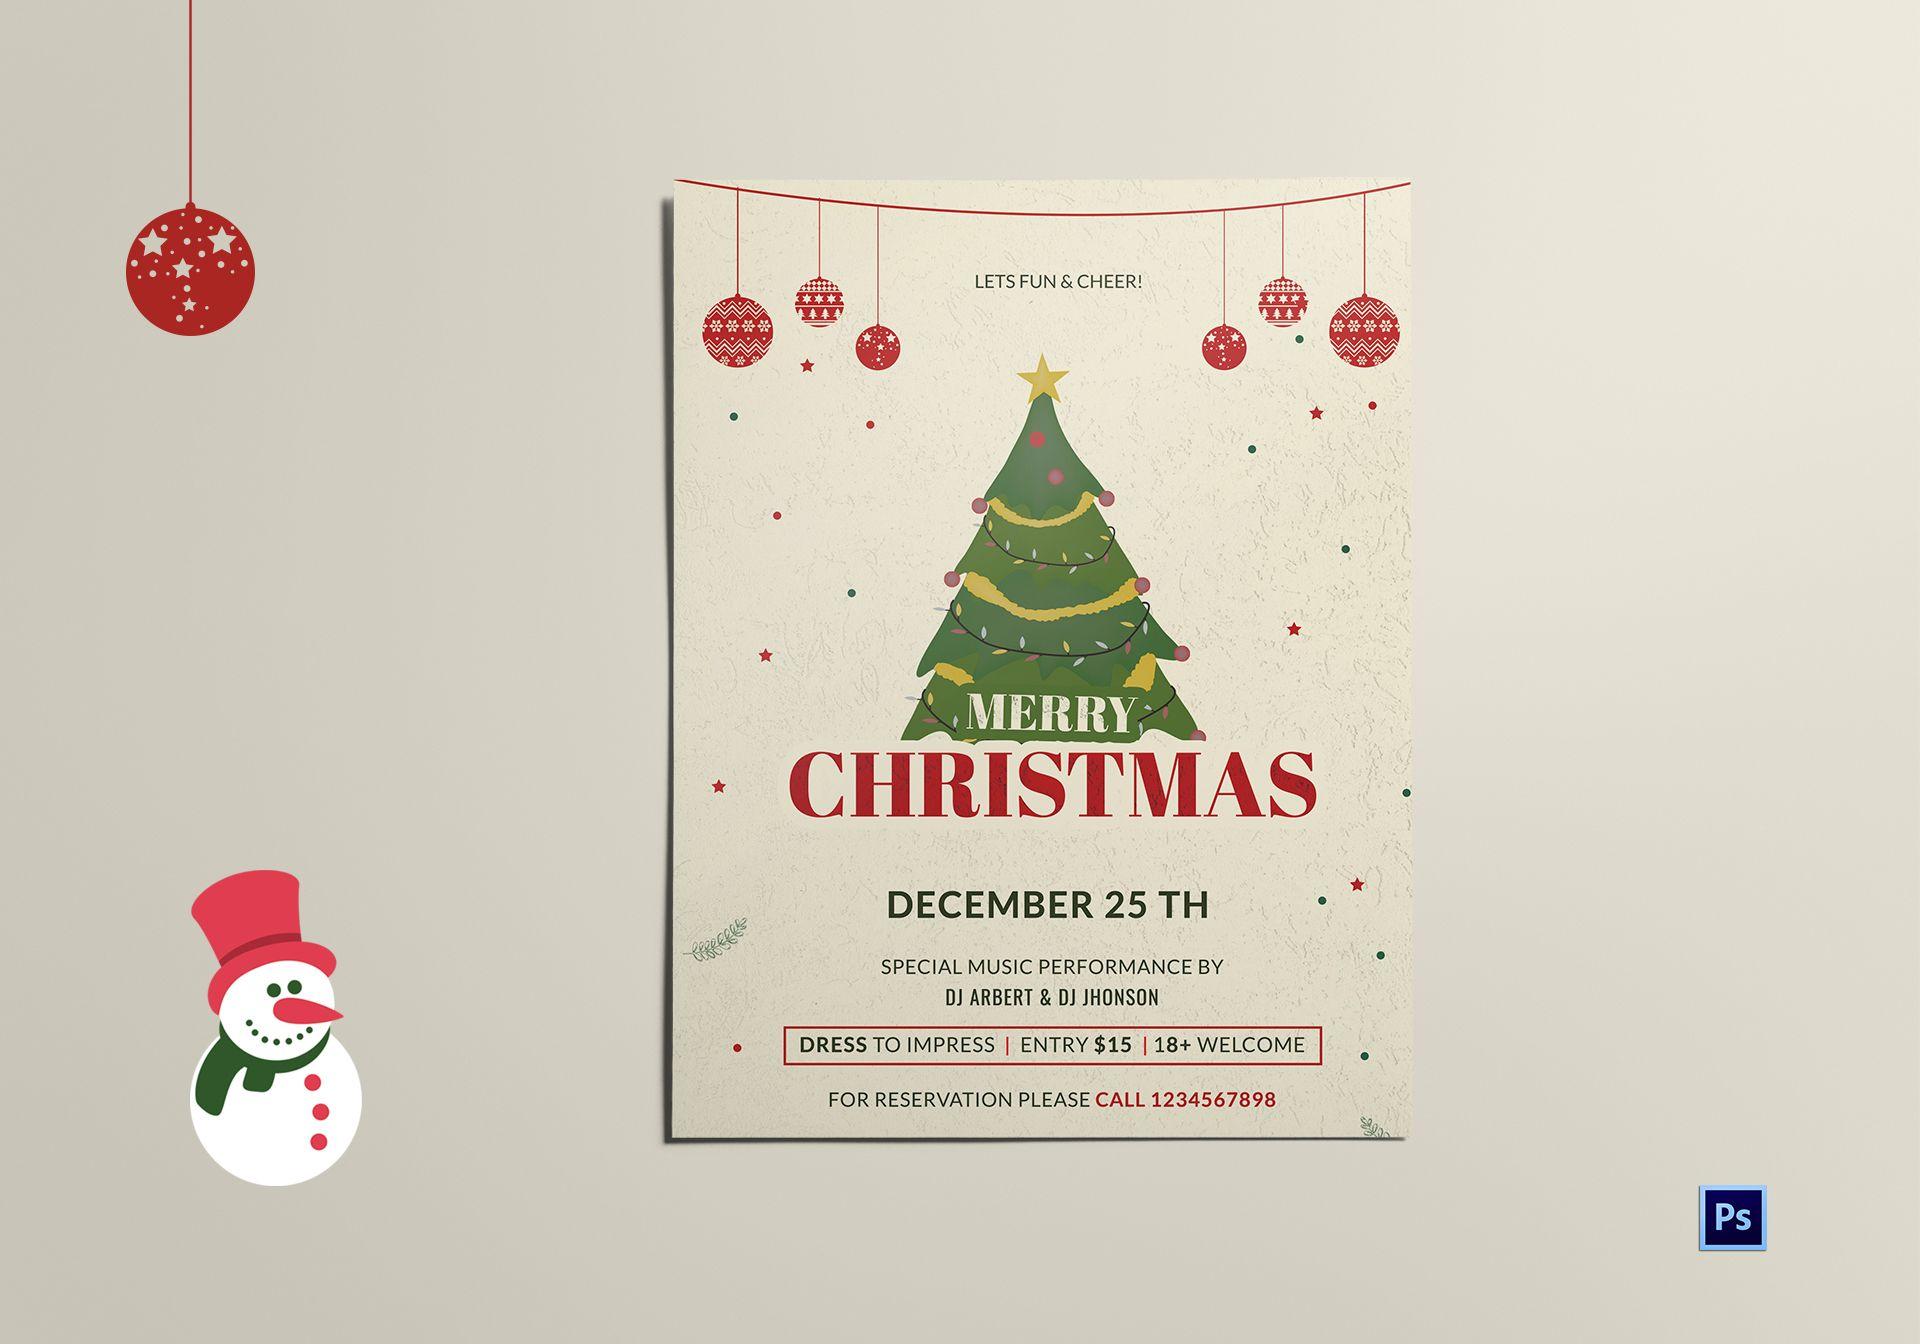 Xmas Tree Flyer Template In Adobe Photoshop